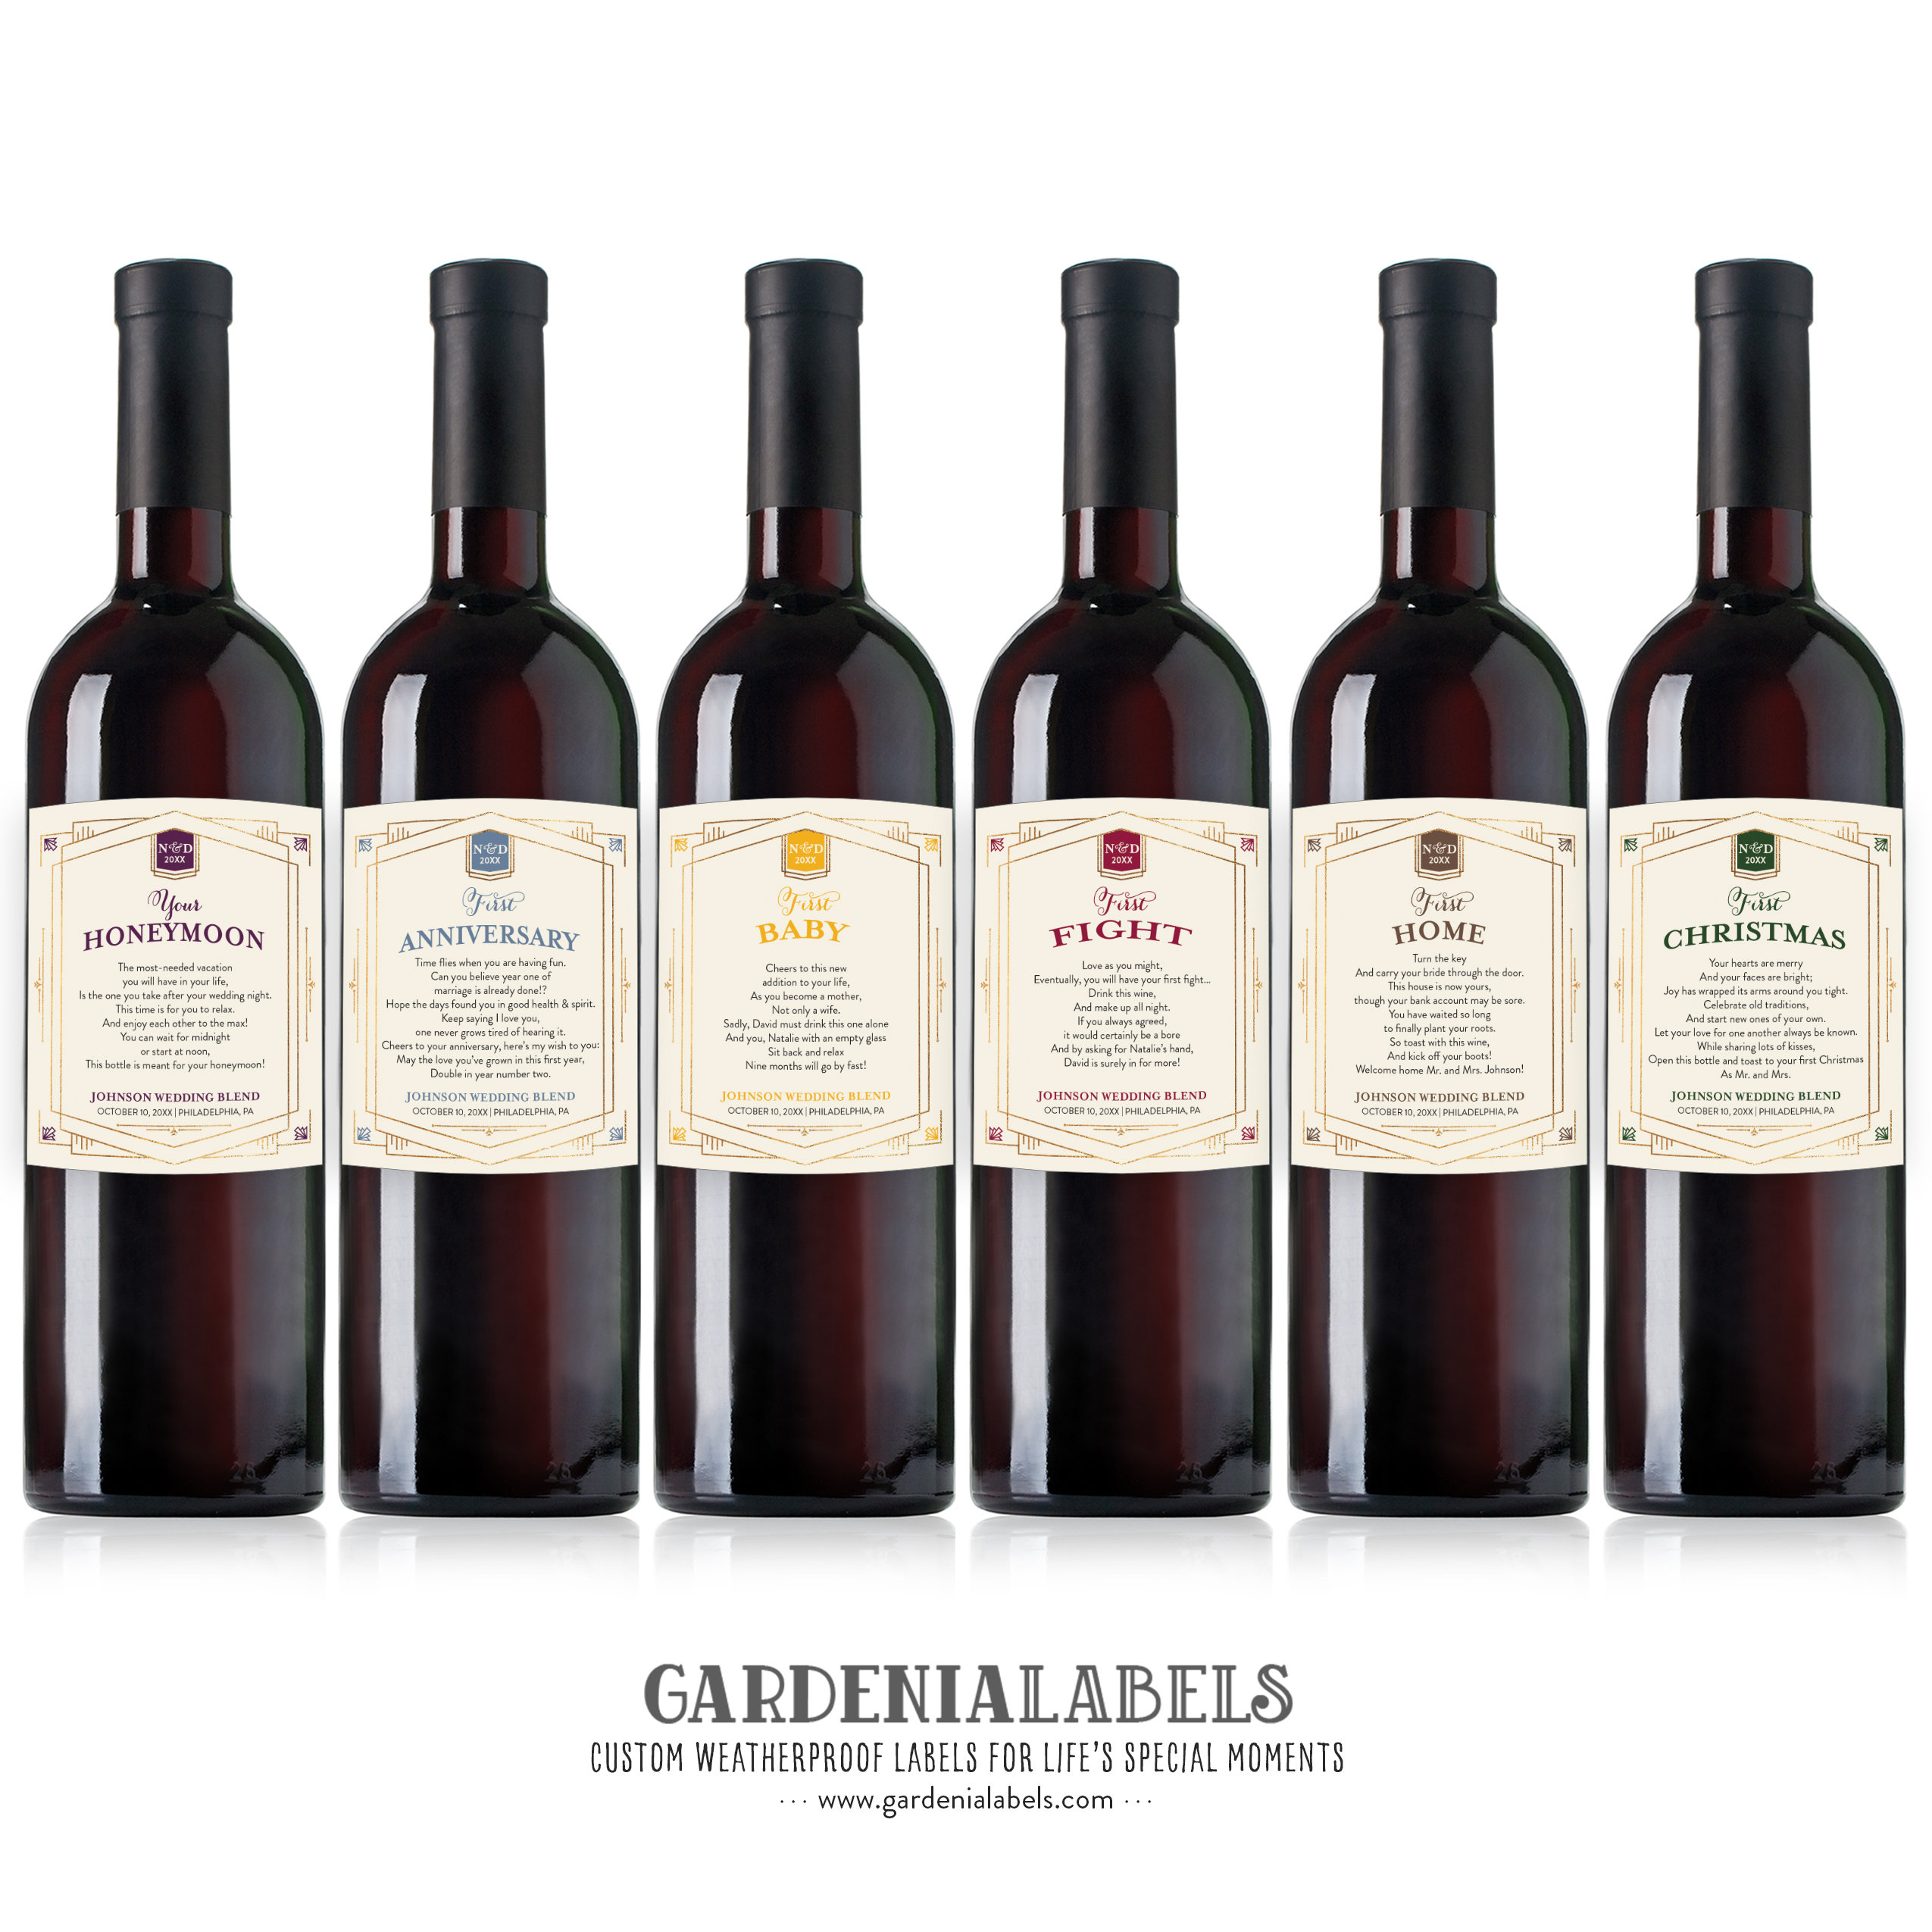 Wedding Gift Wine Basket: Marriage Milestone Wine Labels Bridal Shower Wine Basket